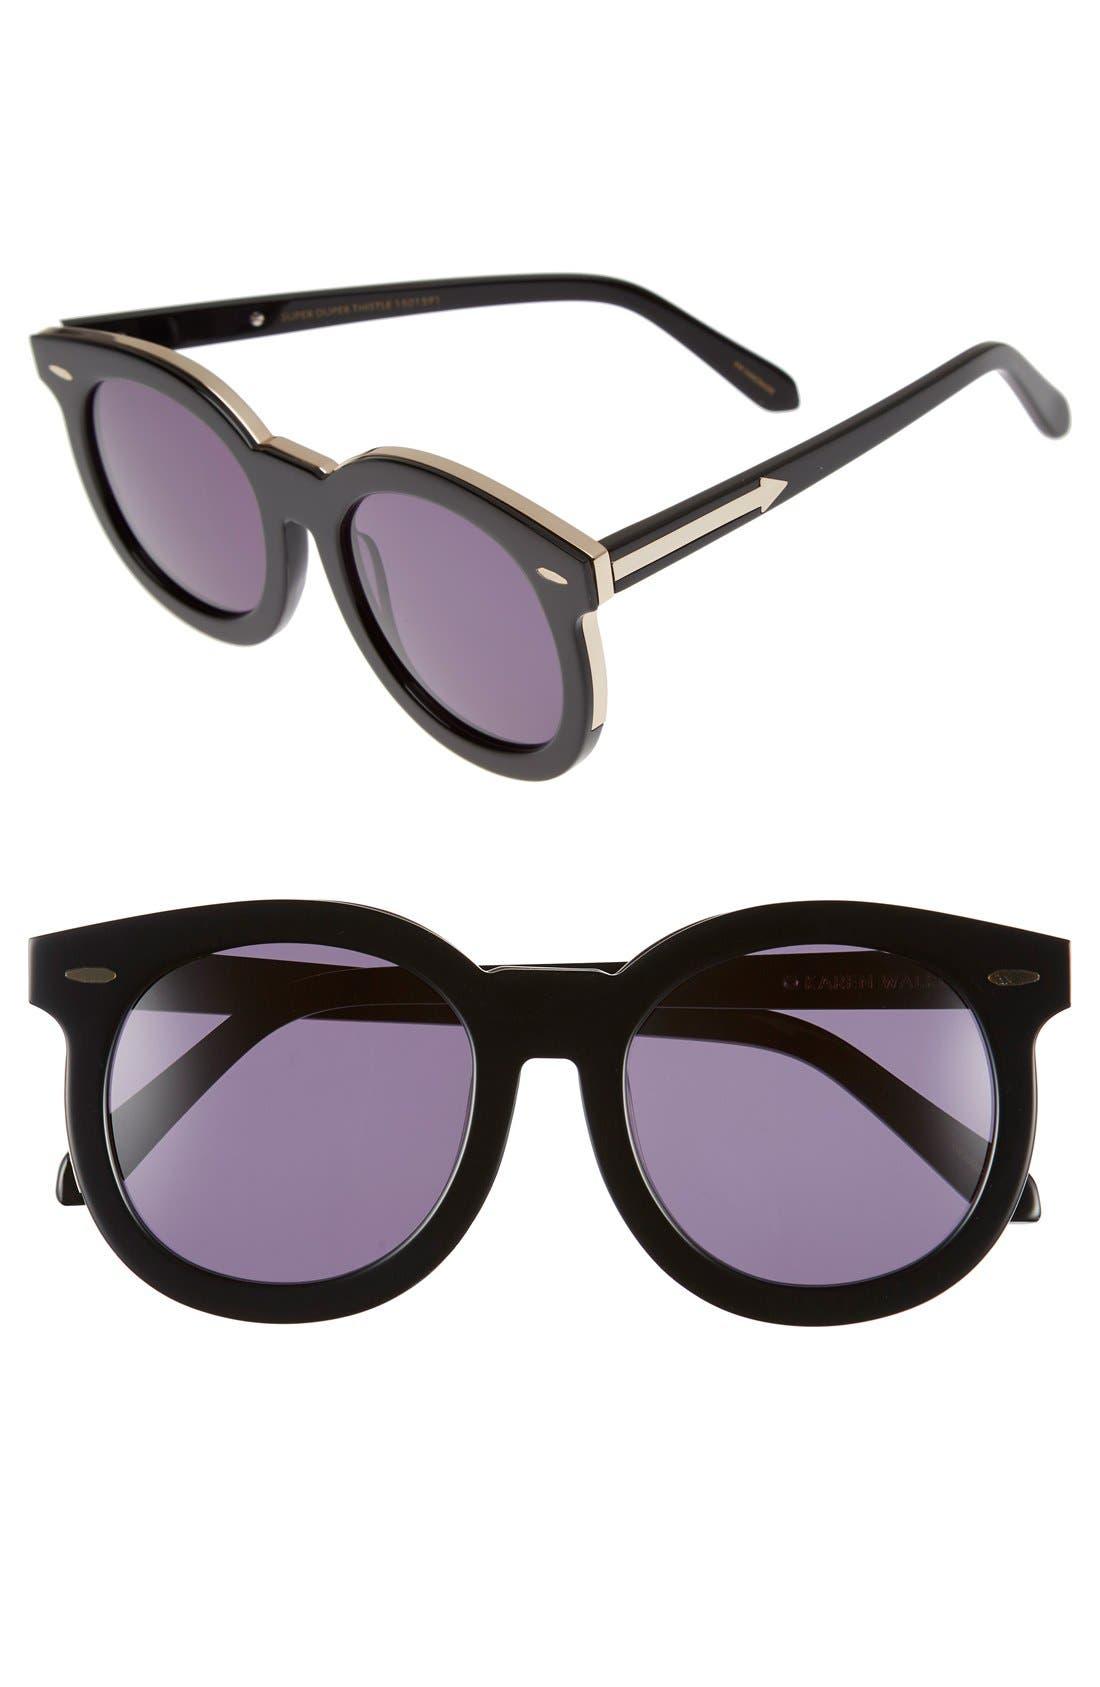 'Super Duper Thistle' 52mm Retro Sunglasses,                             Main thumbnail 1, color,                             Black/ Gold